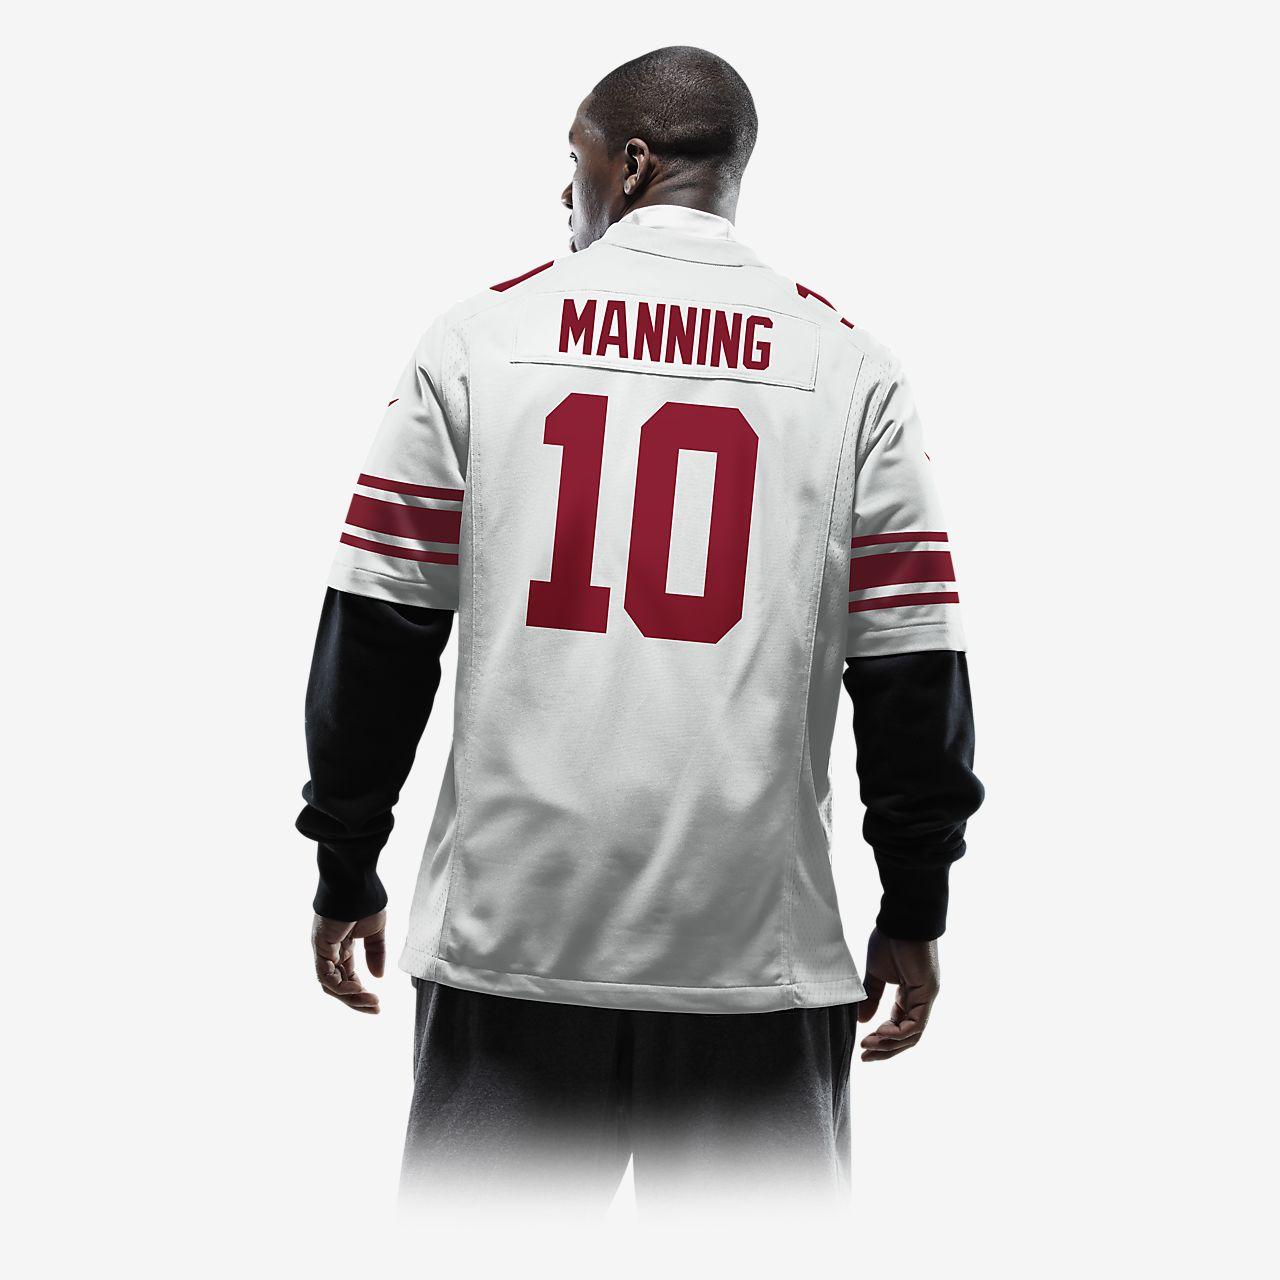 ... NFL New York Giants (Eli Manning) Men's Football Away Game Jersey